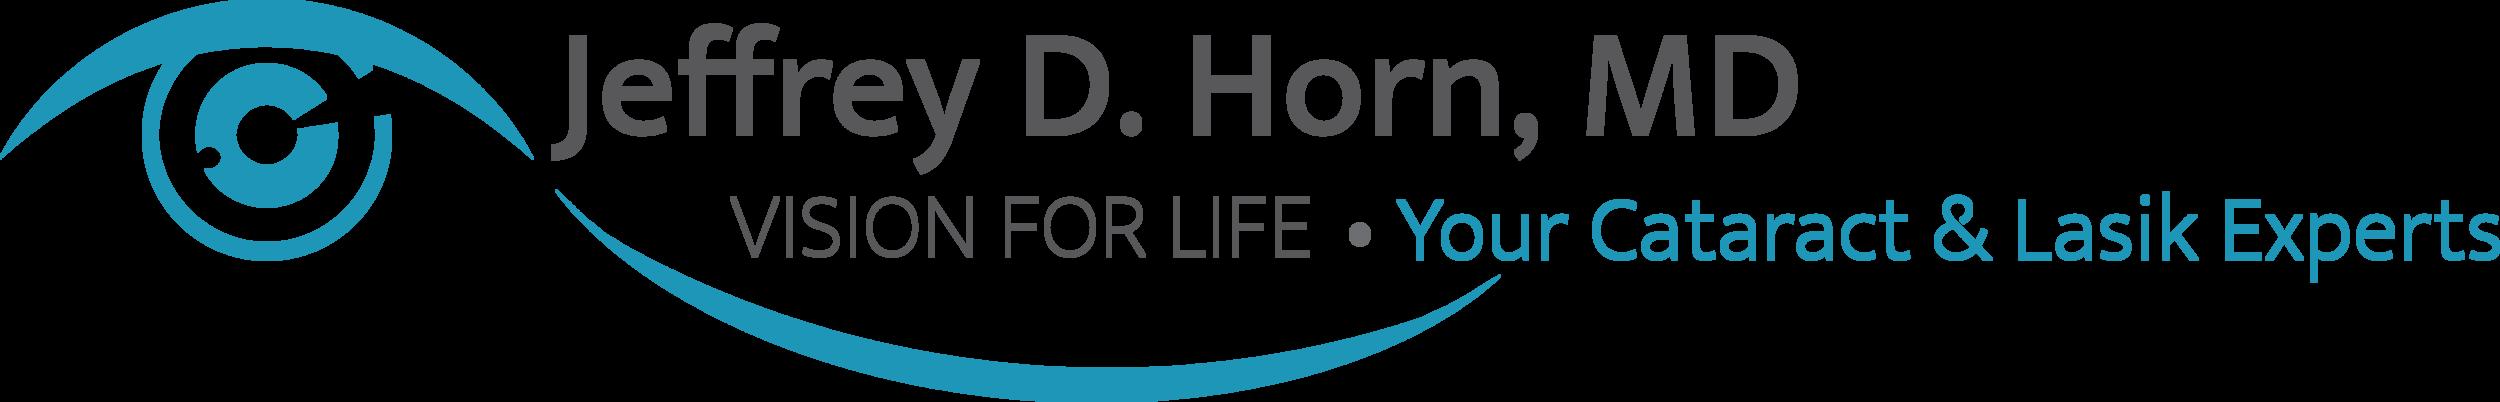 Vision For Life Medical Advertising Testimonial